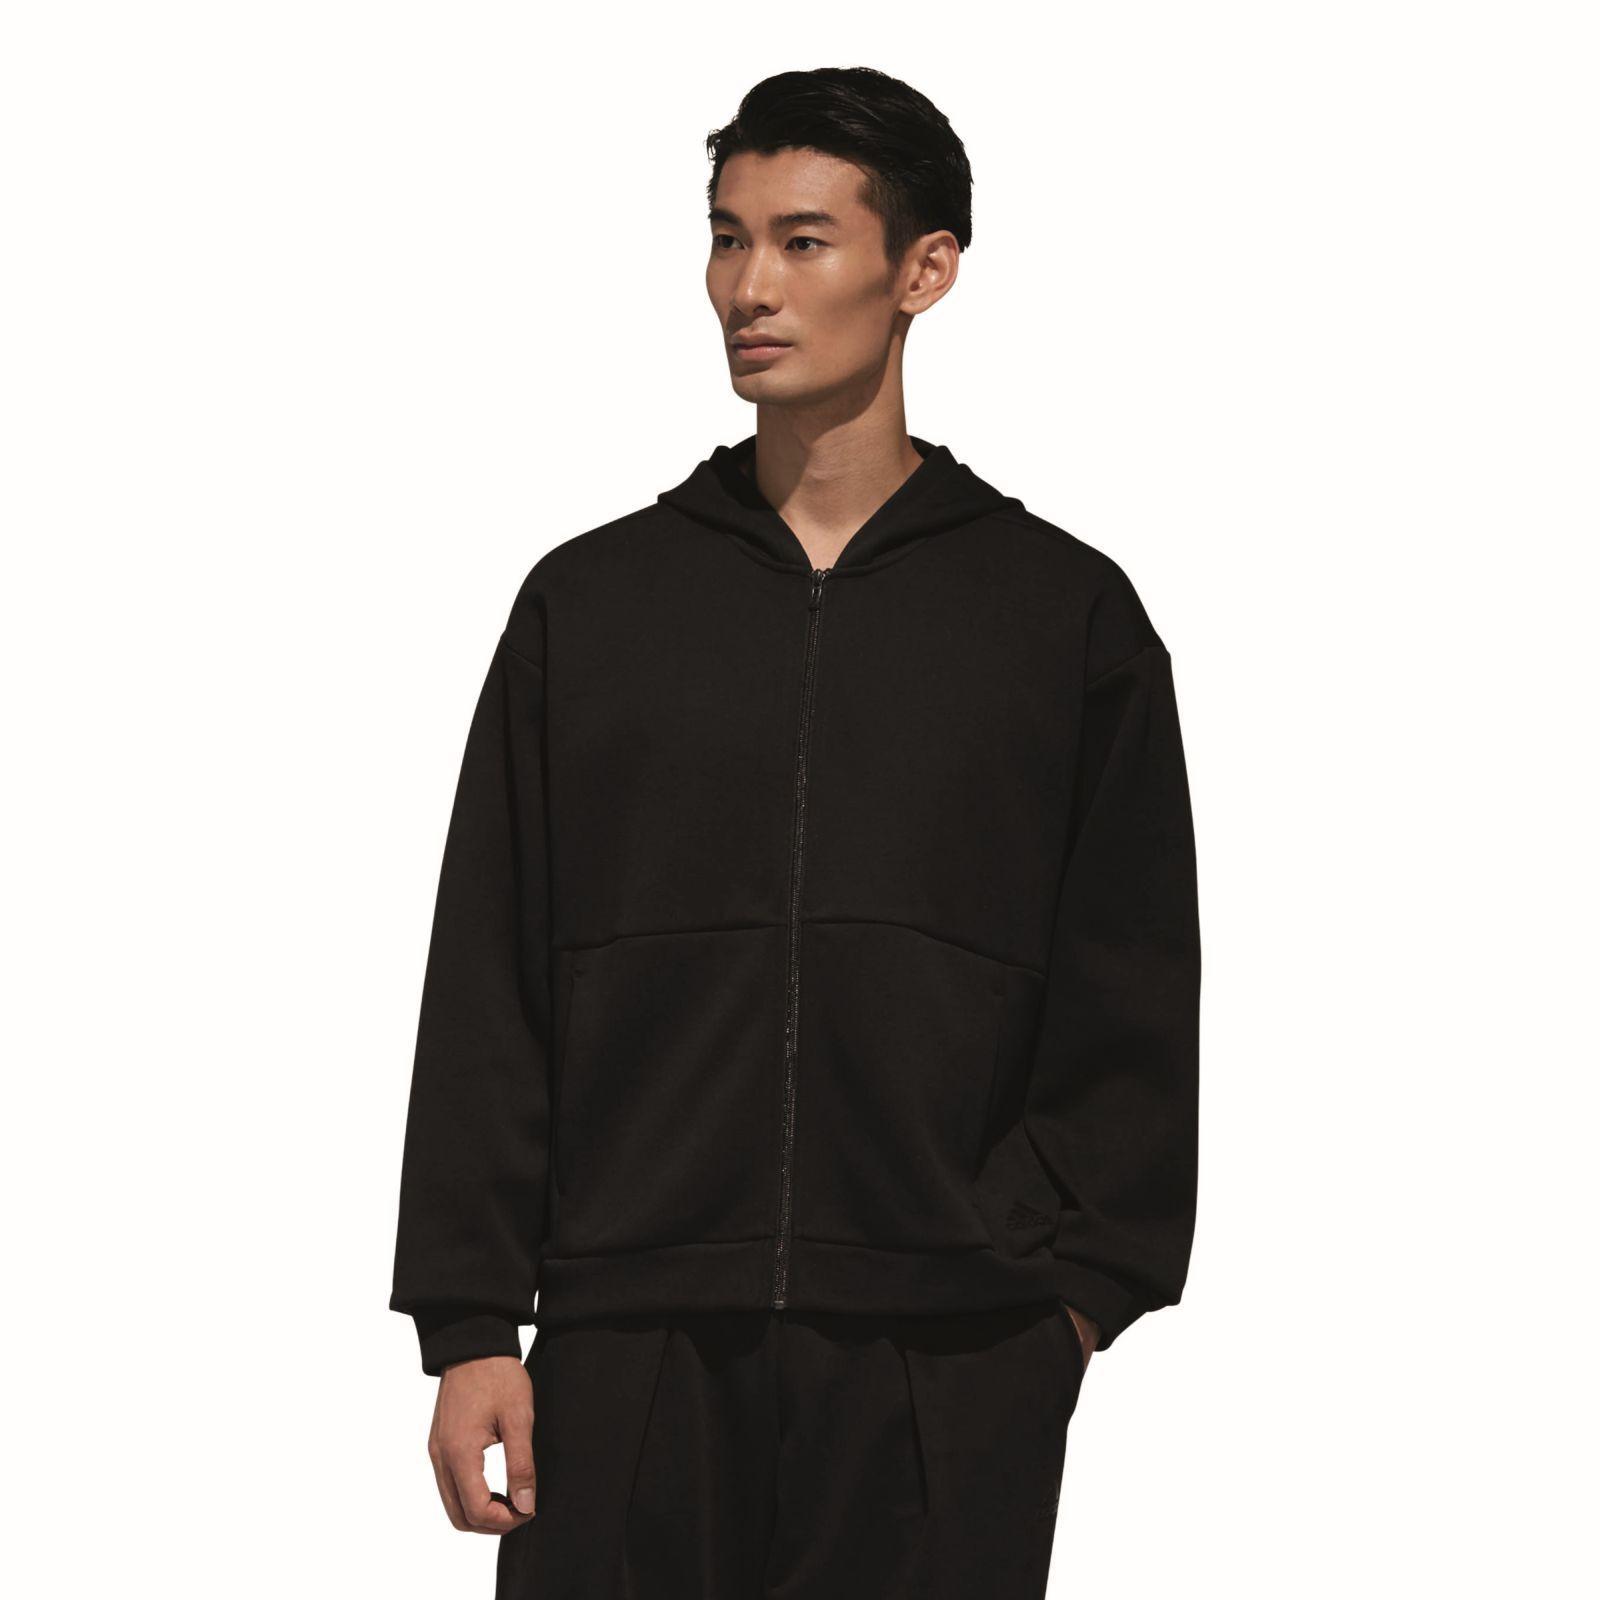 Adidas performance señores capucha chaqueta s2s  SPC HD Hood negro  bienvenido a comprar